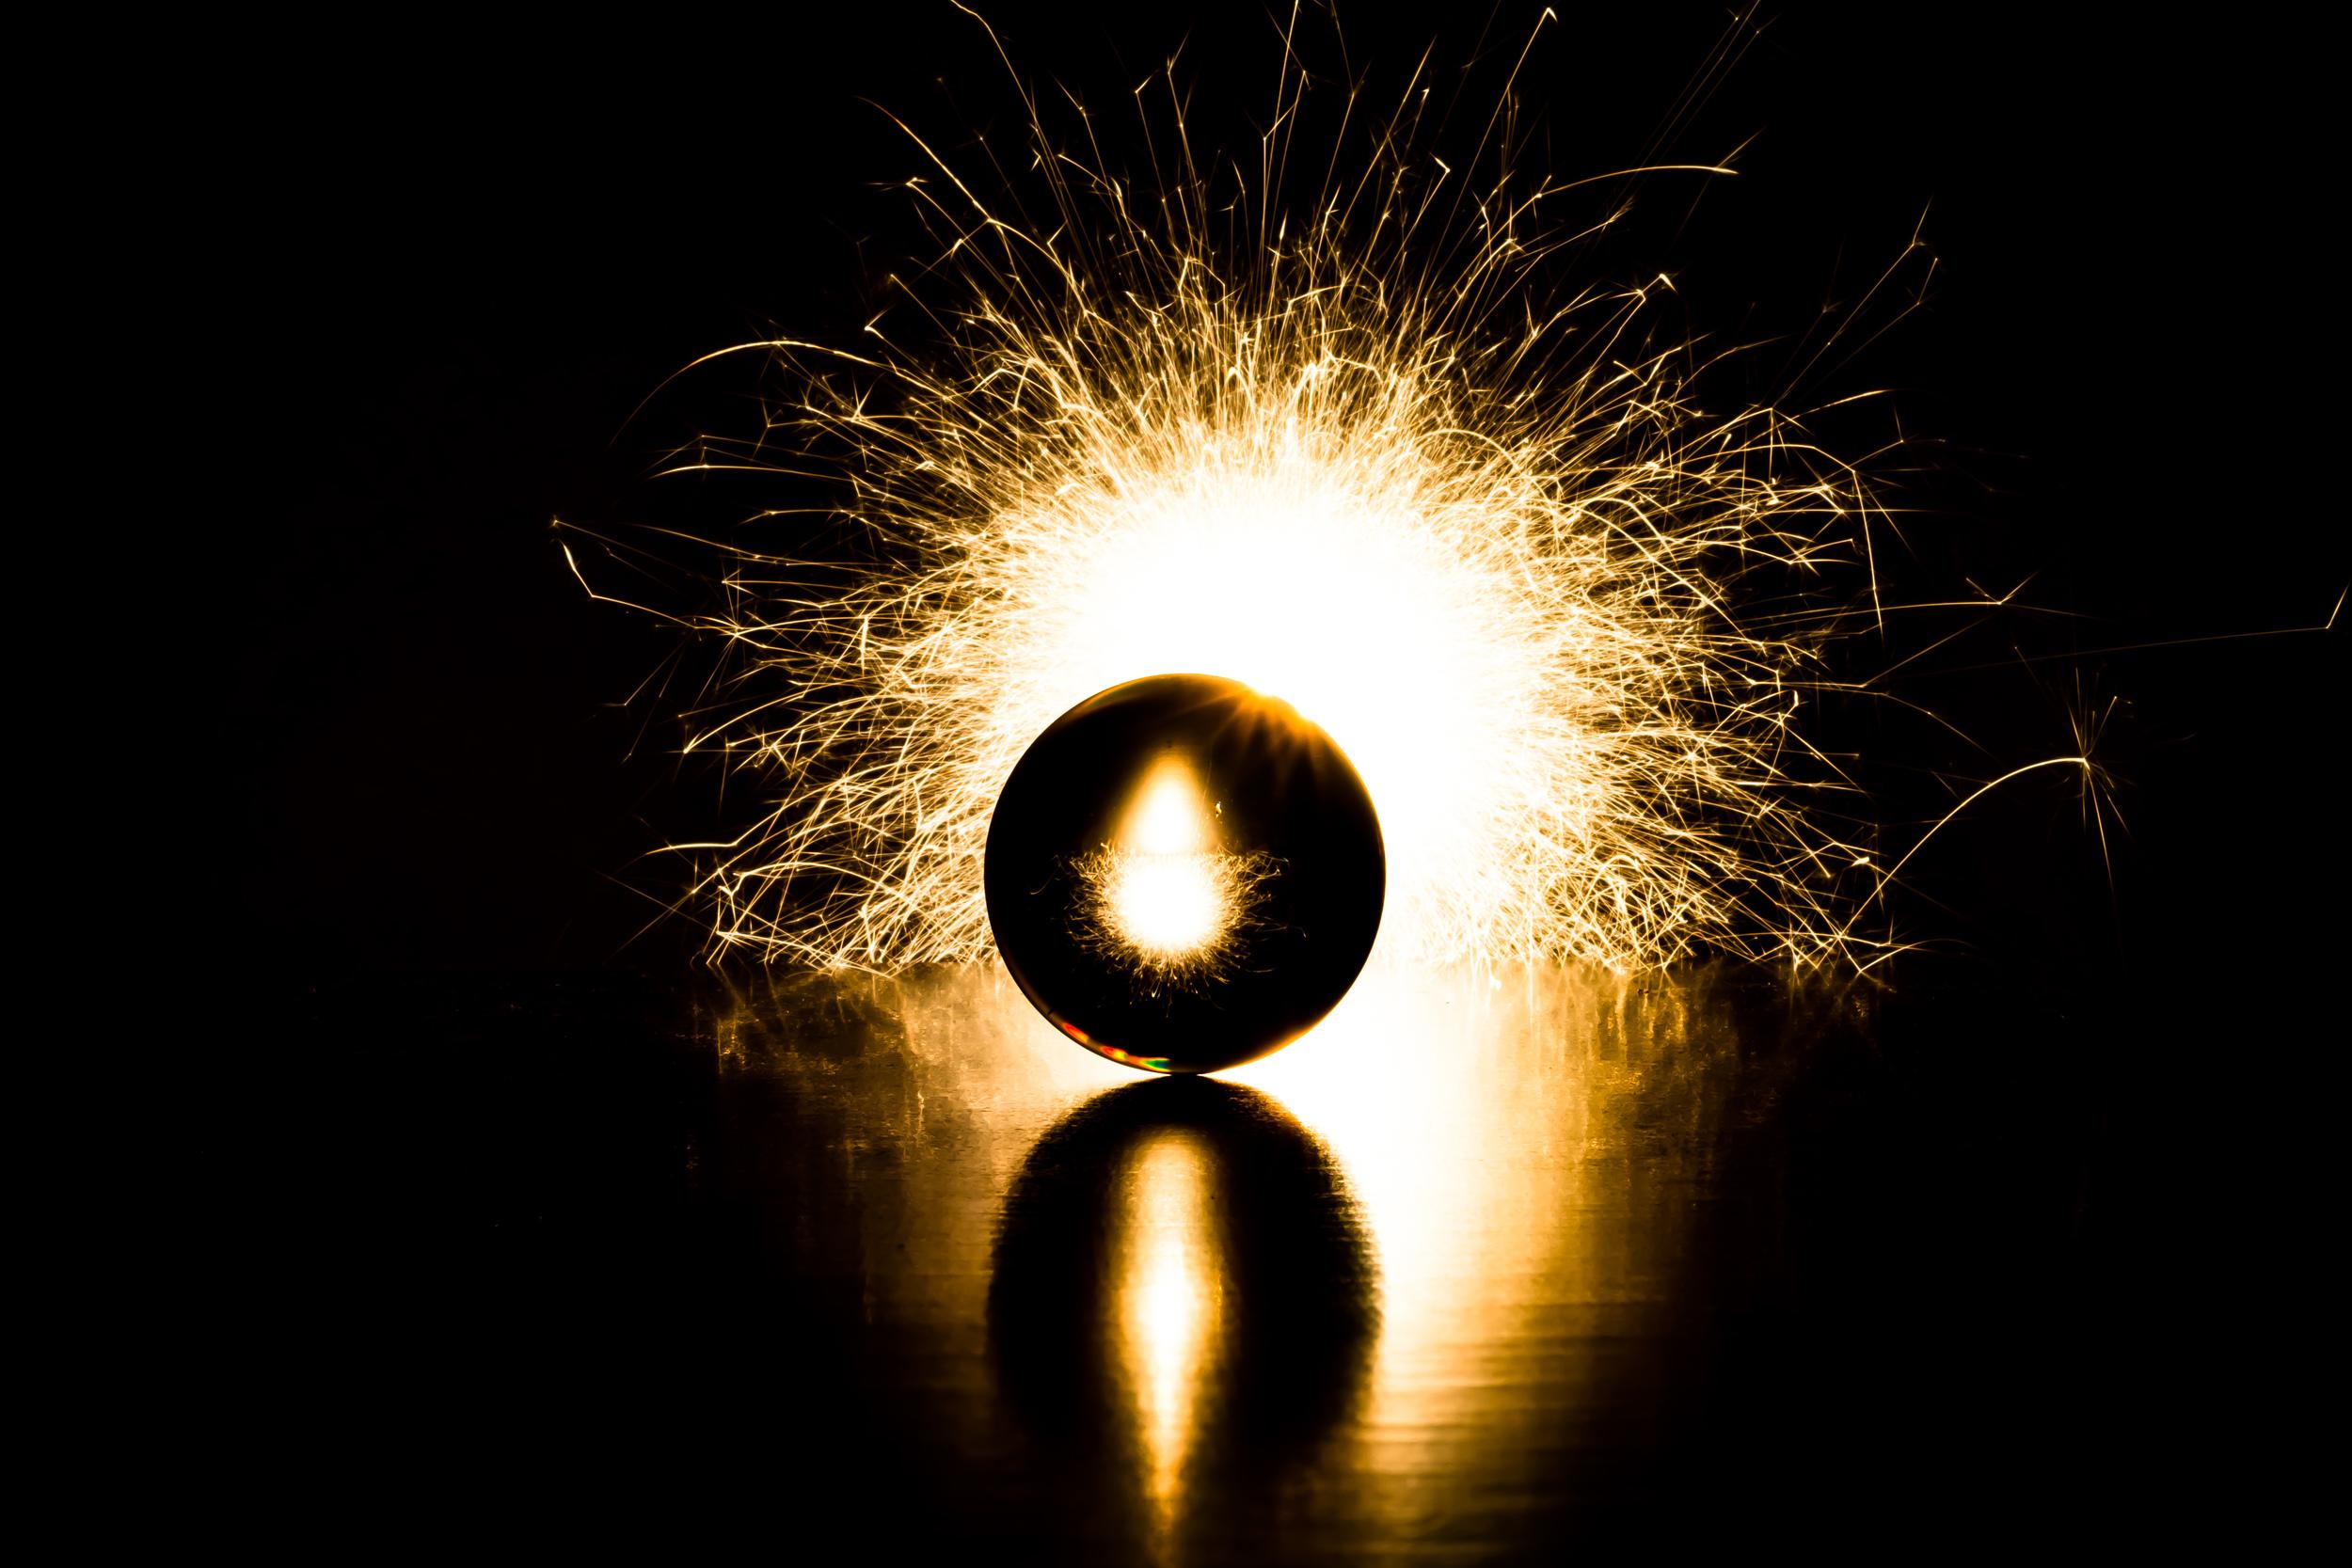 Viewfinder-spel-vuur-kristallen-bol-geheimzinnig-eigenzinnigie-fotografievuurwerk-verjaardag-huwelijk-taatr